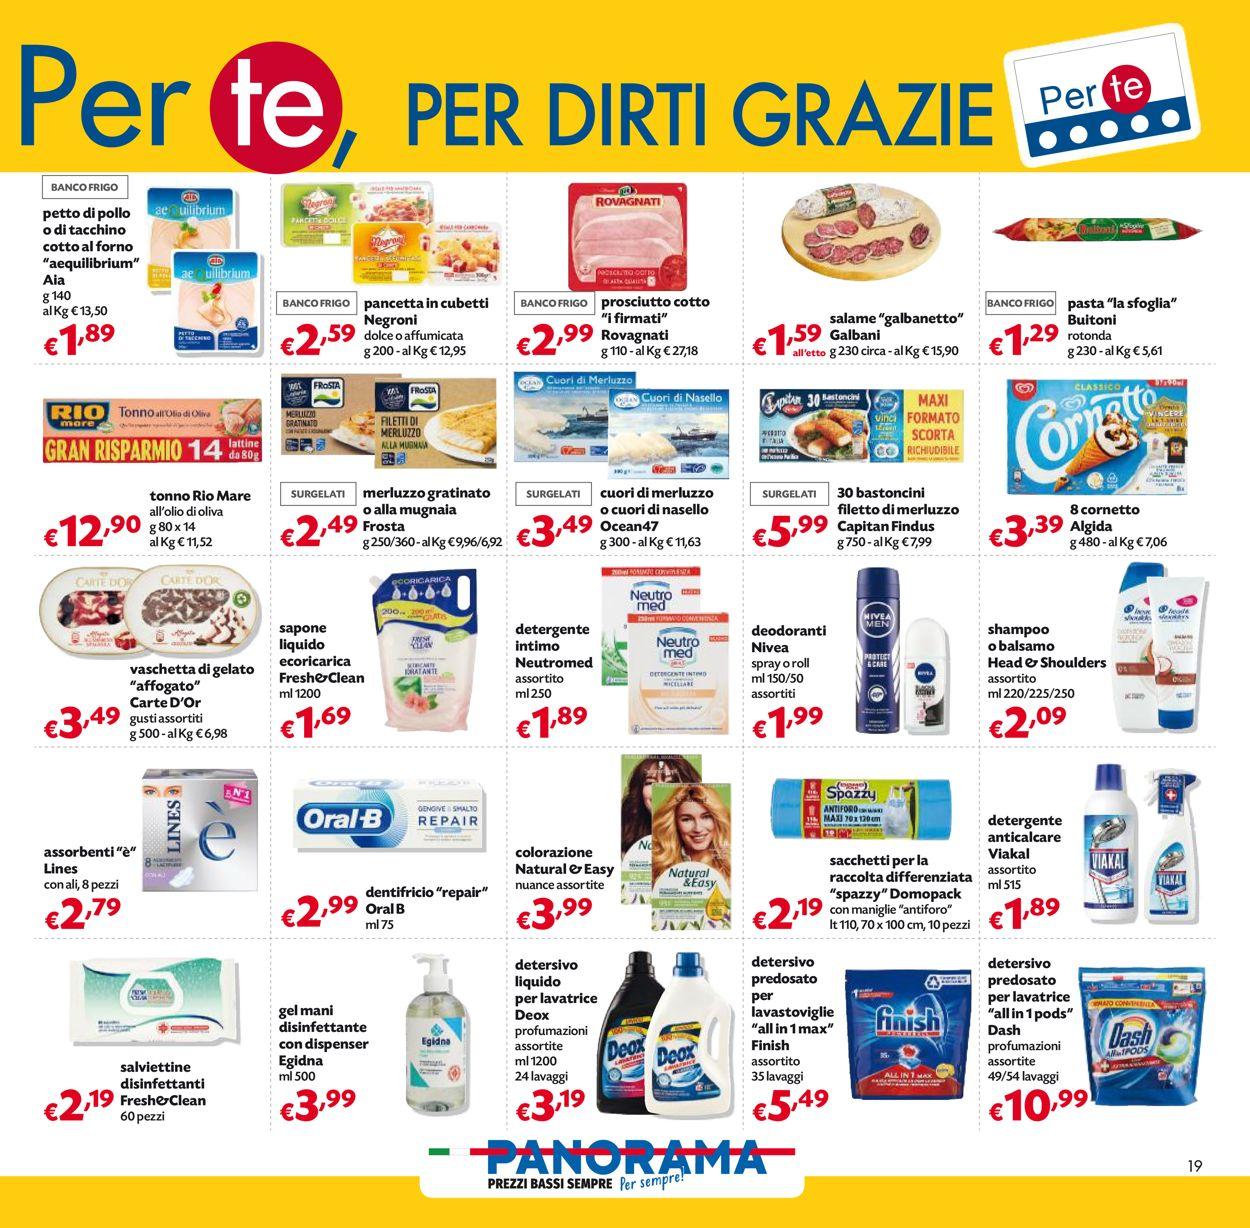 Volantino Pam Panorama - Pasqua 2021! - Offerte 22/03-05/04/2021 (Pagina 19)